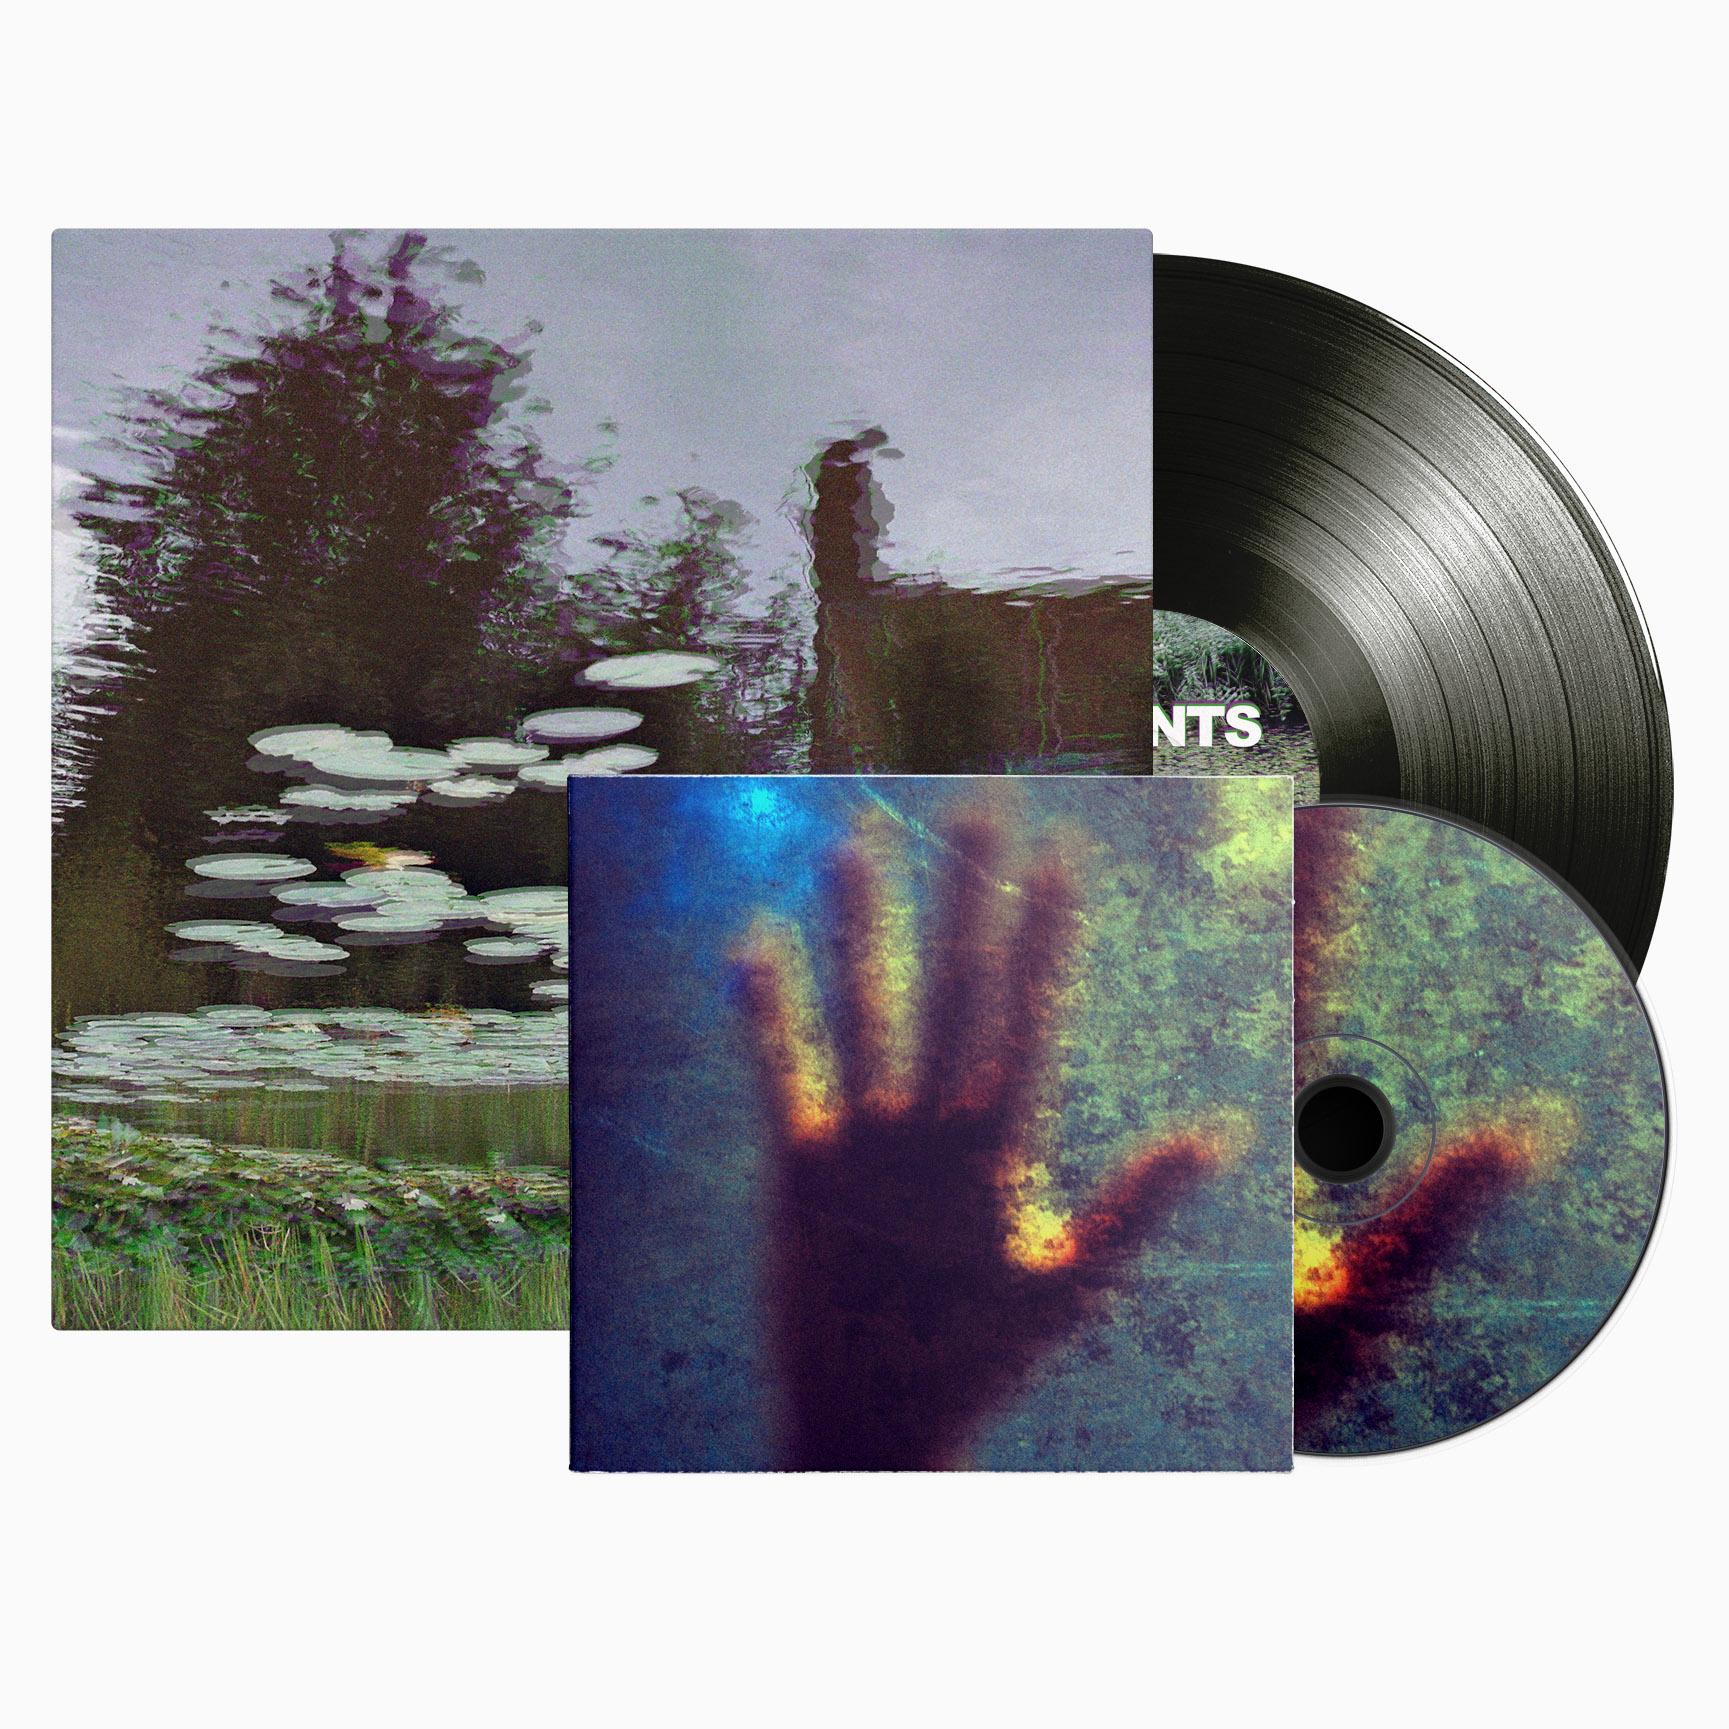 Haunts - LP & EP